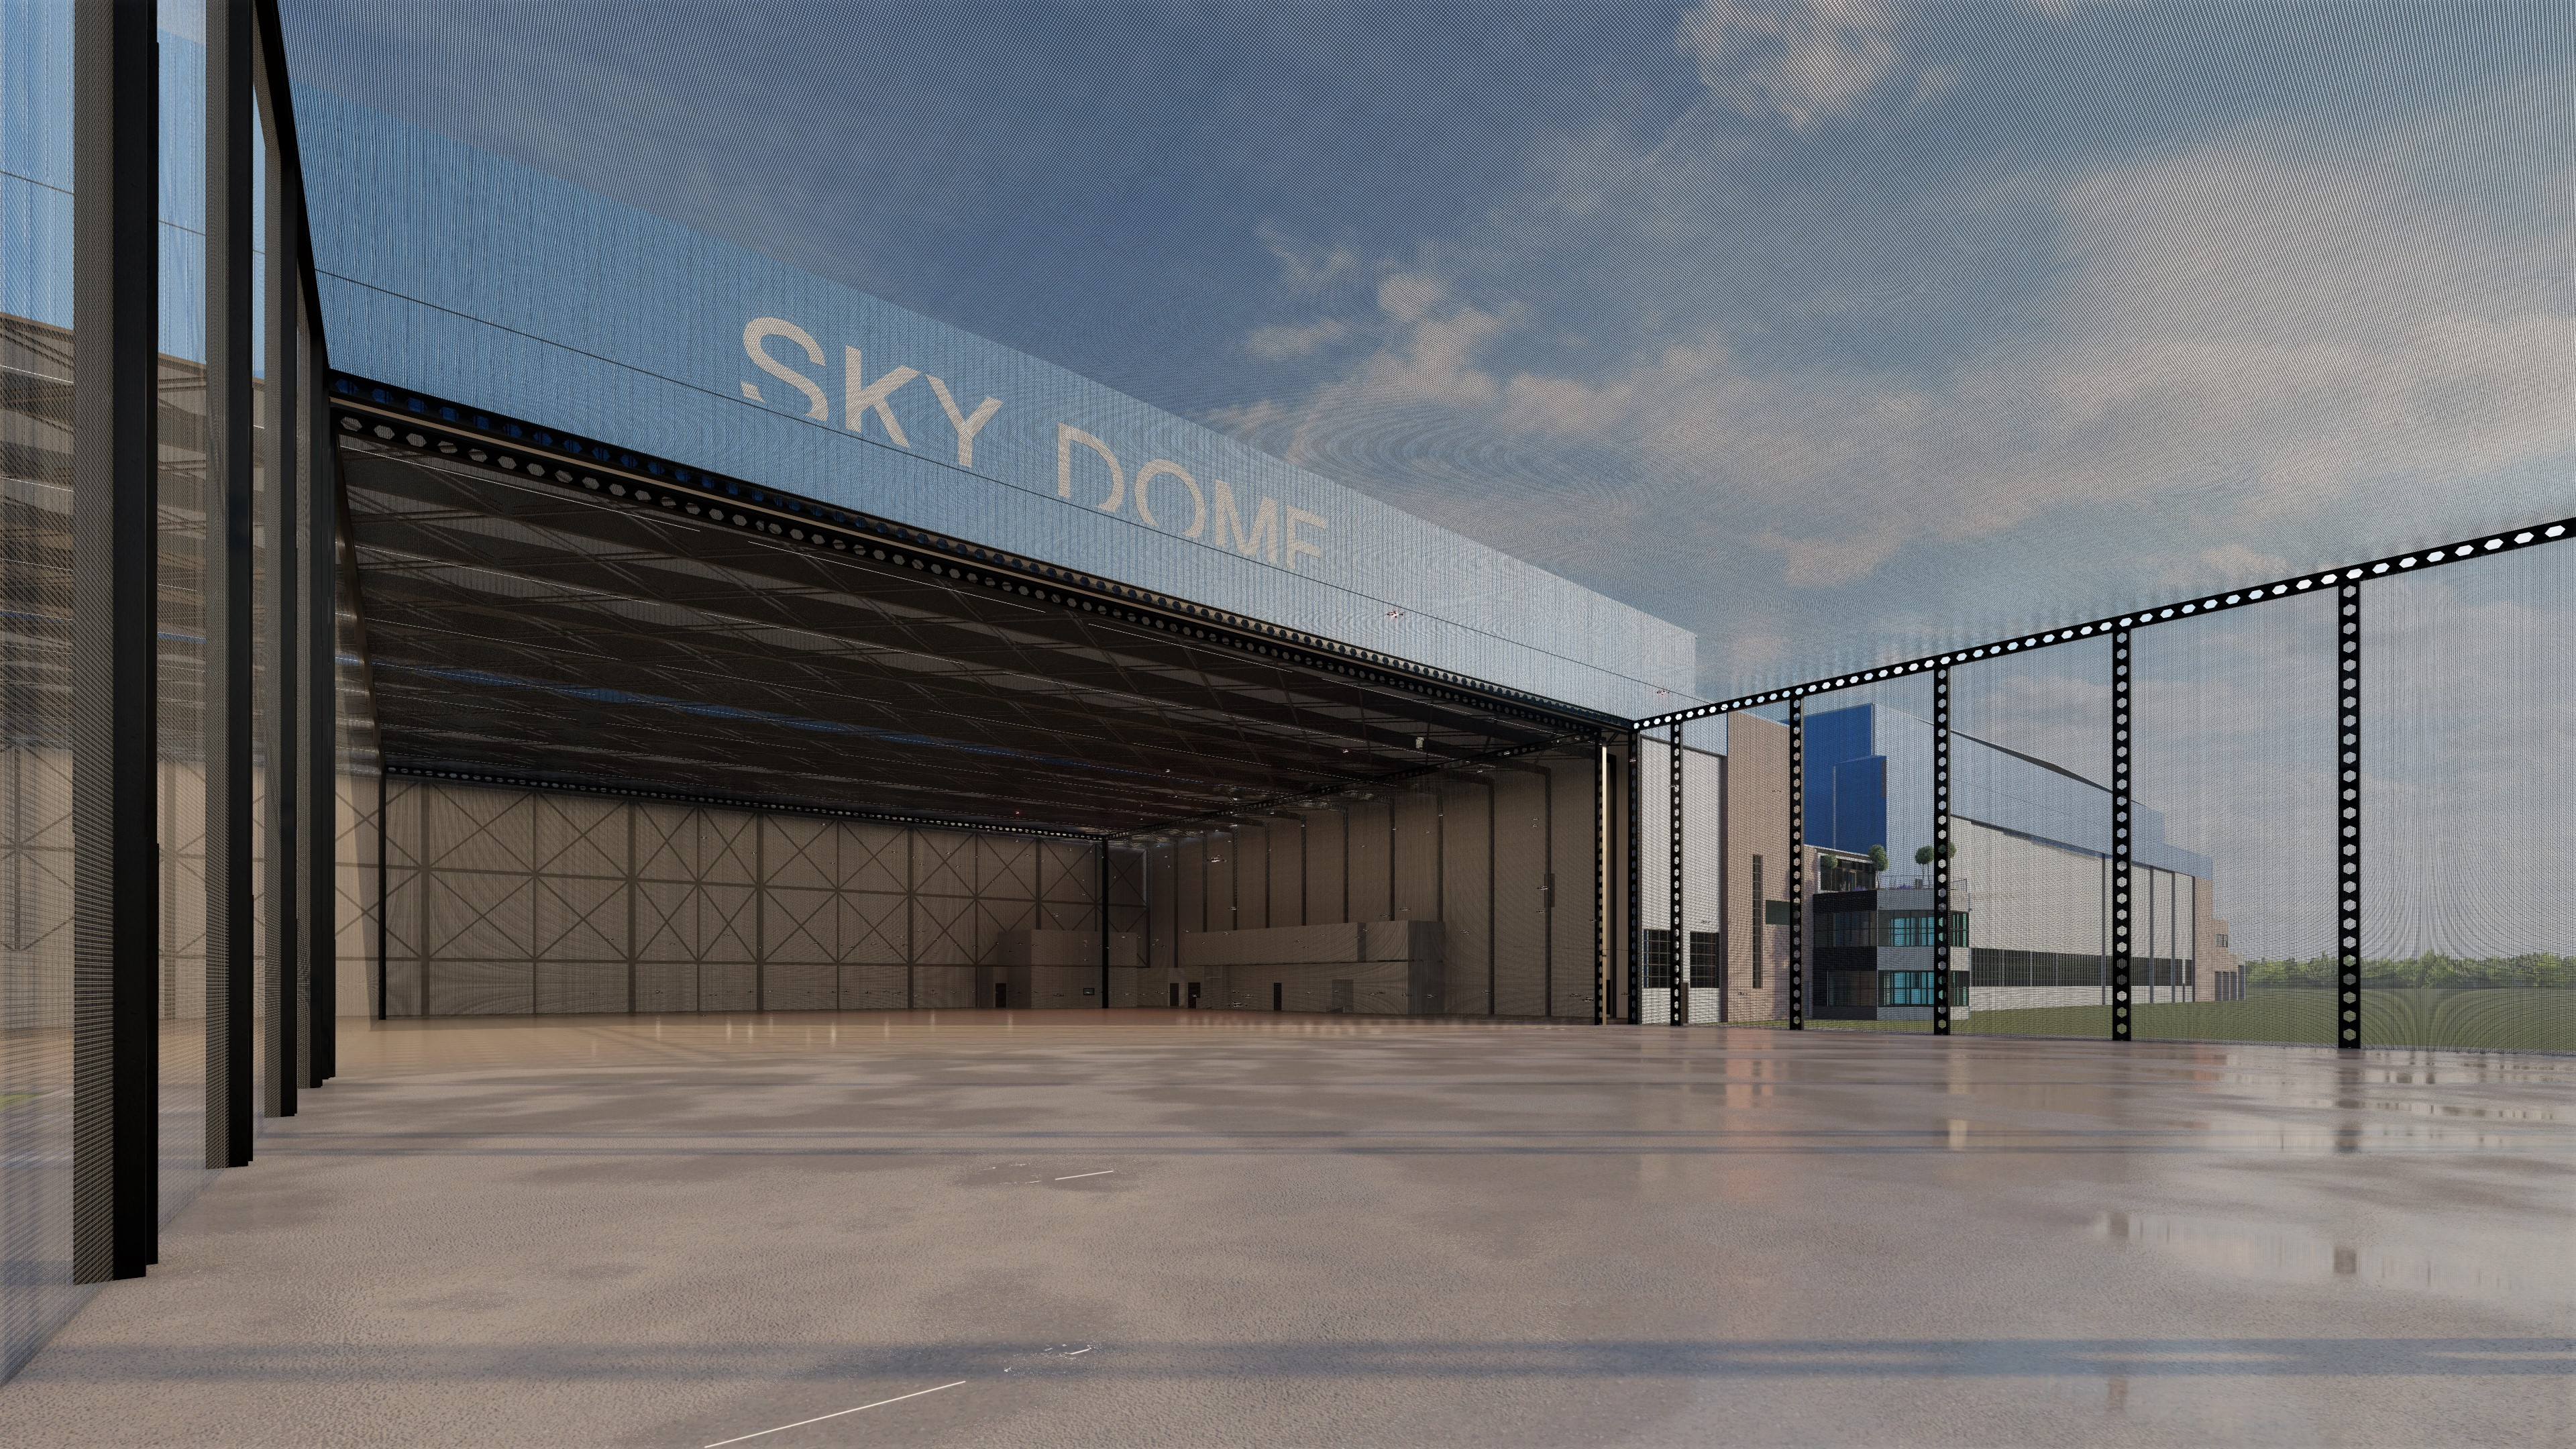 Sky Dome Artist Rendering